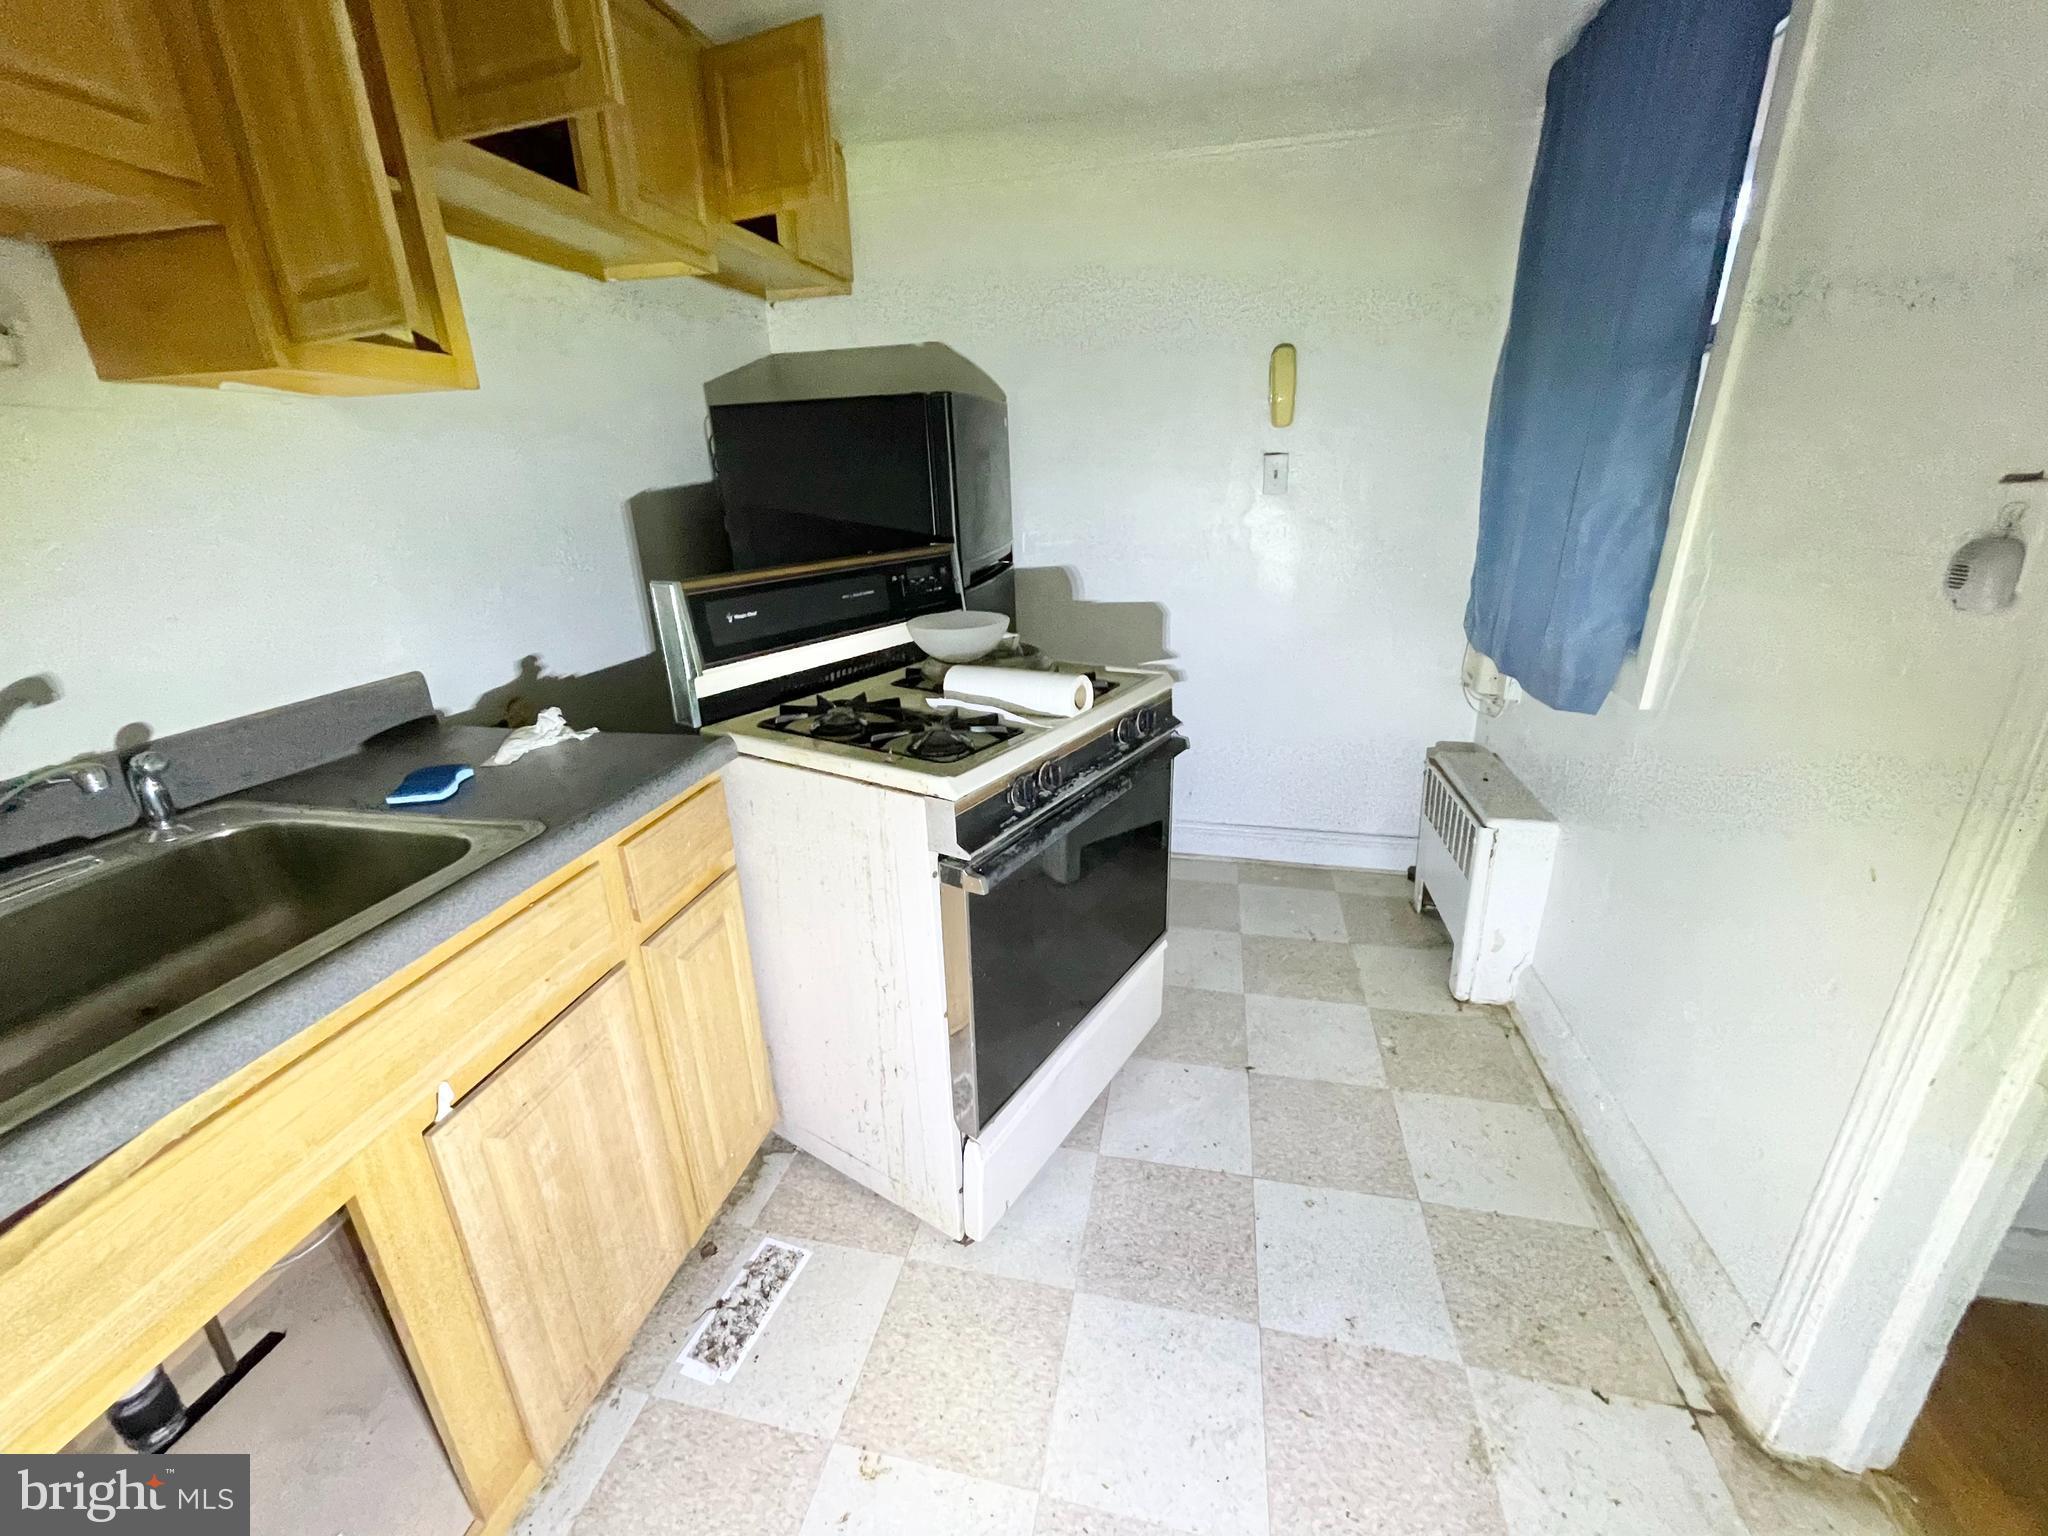 8513 CHESTNUT OAK ROAD, BALTIMORE, Maryland 21234, 3 Bedrooms Bedrooms, ,2 BathroomsBathrooms,Townhouse,For Sale,8513 CHESTNUT OAK ROAD,MDBC520528